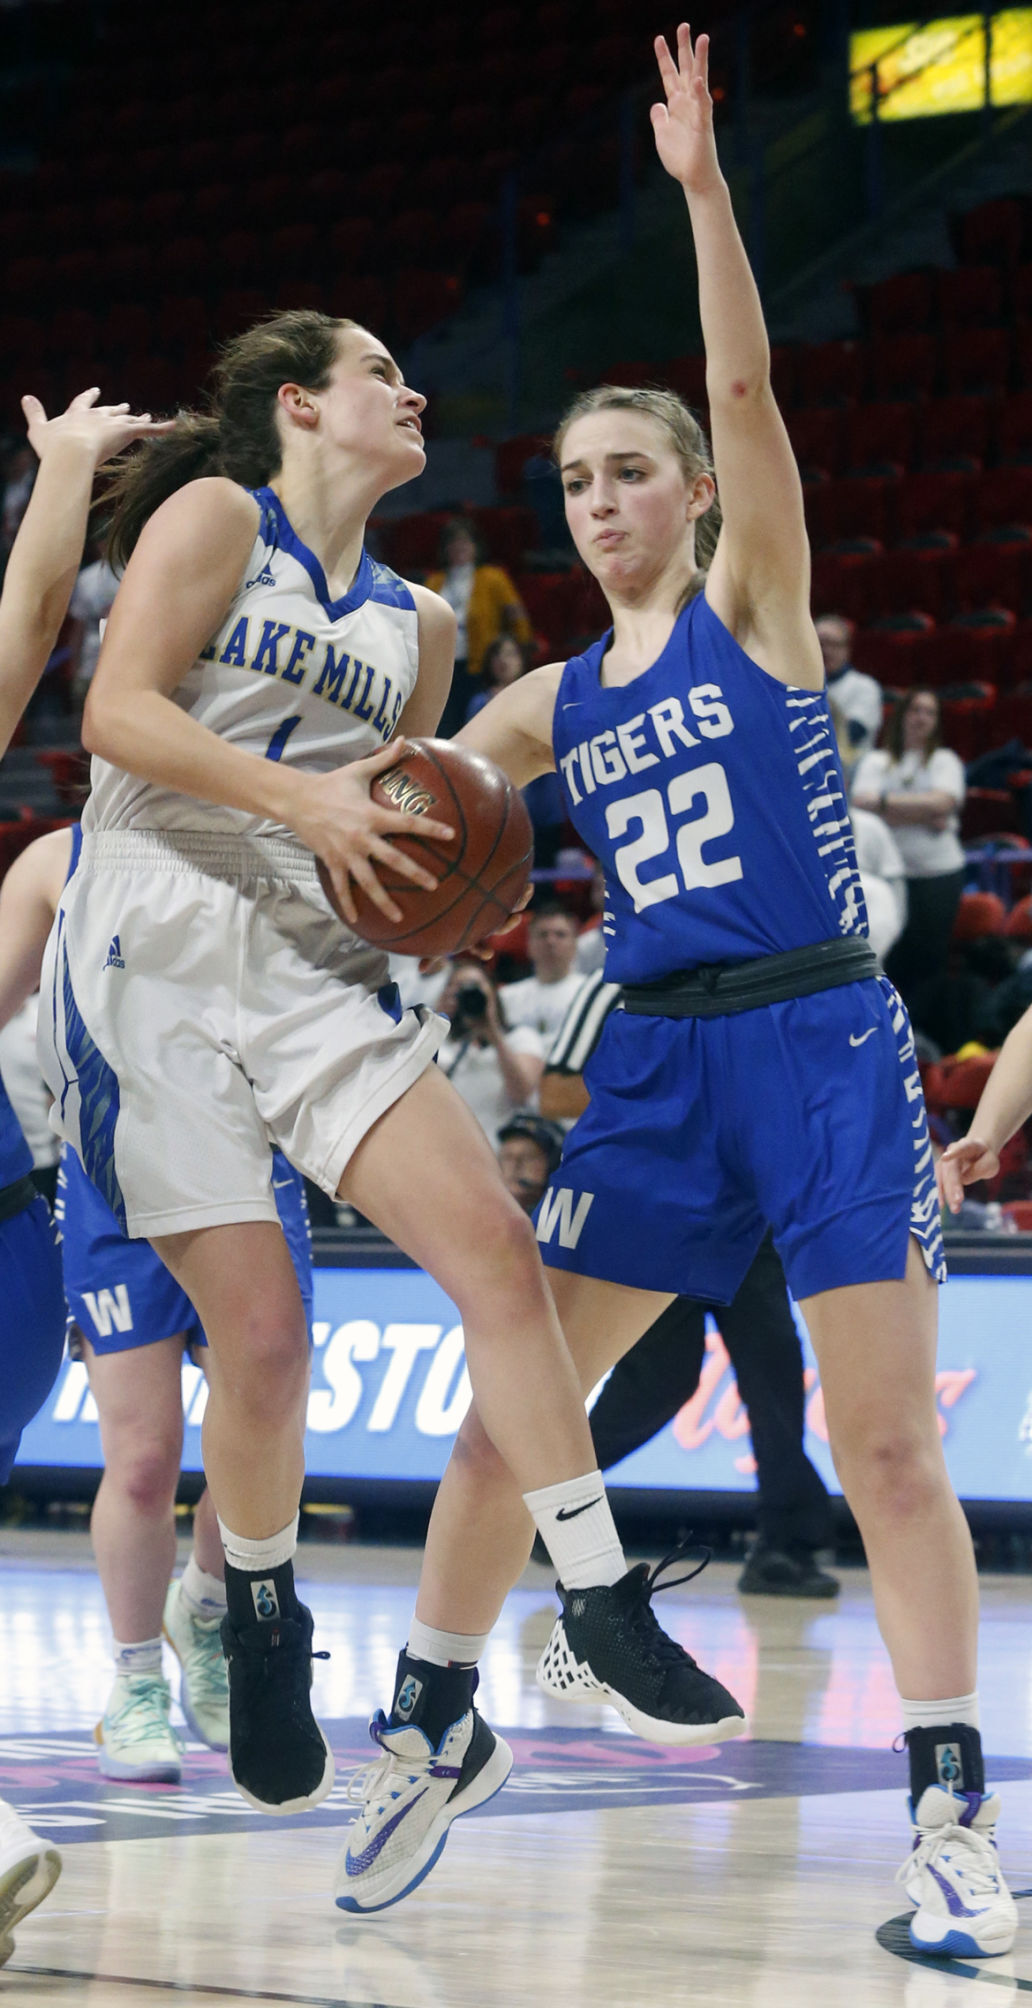 WIAA state girls basketball photo: Lake Mills' Taylor Roughen drives